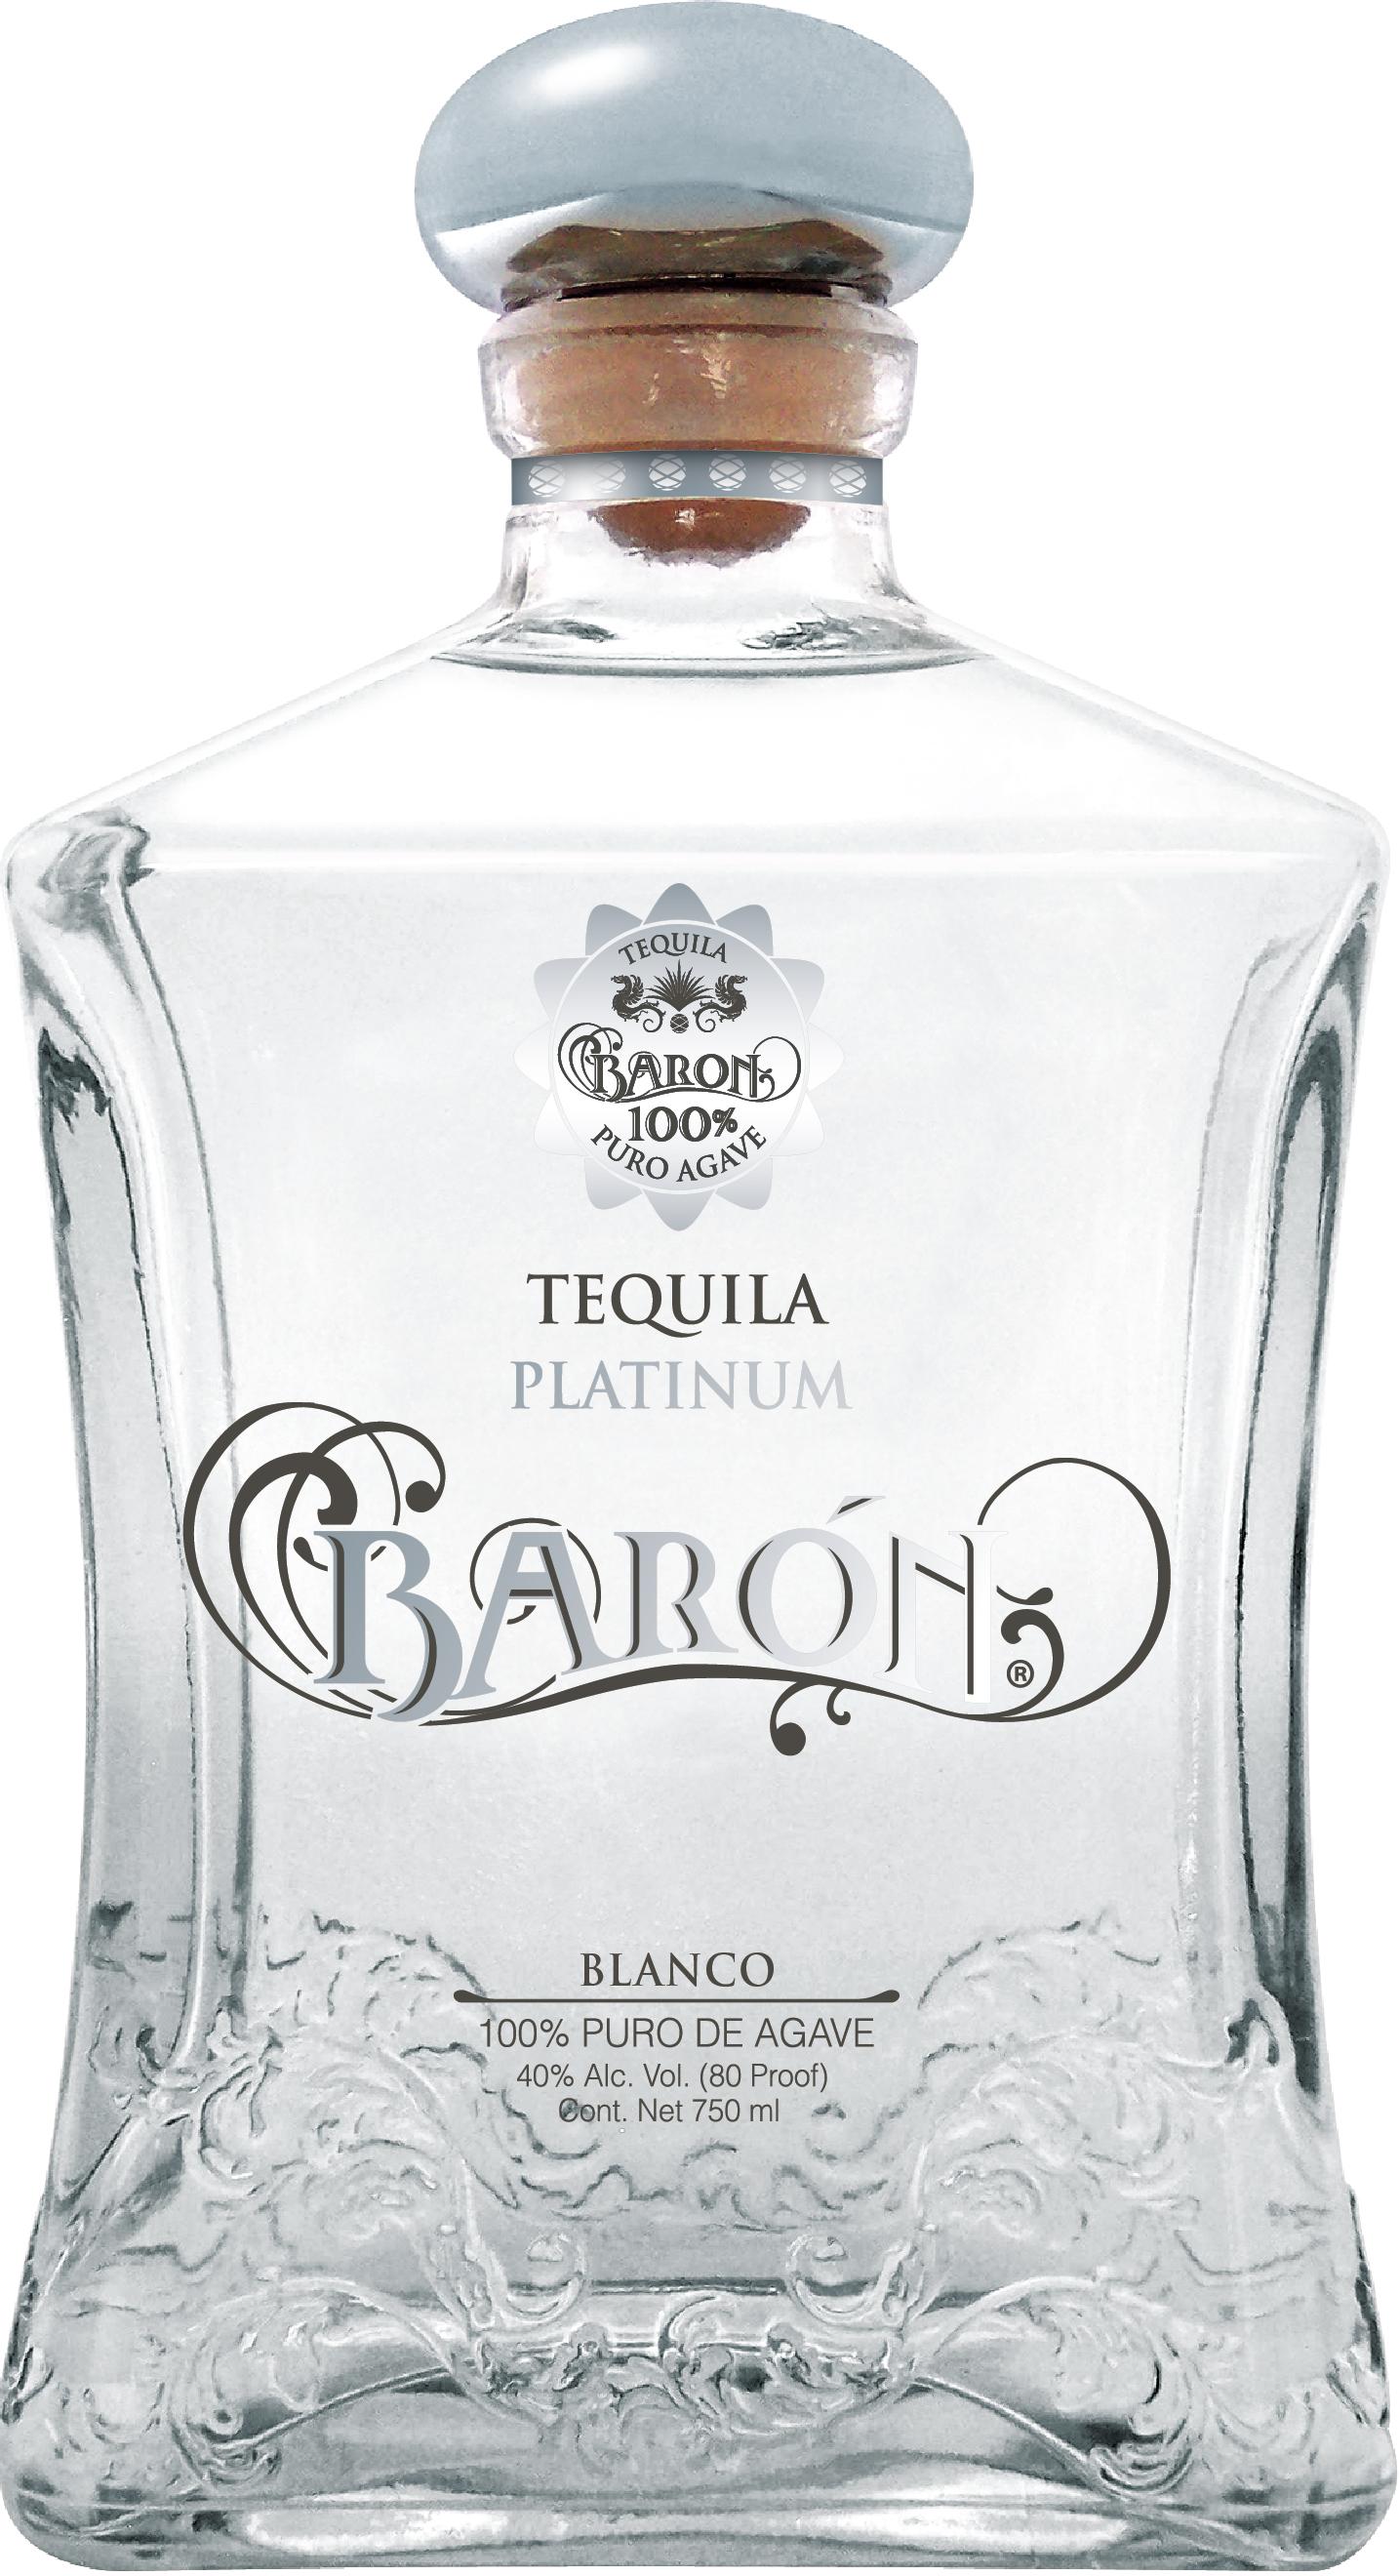 Barón Platinum Blanco Tequila